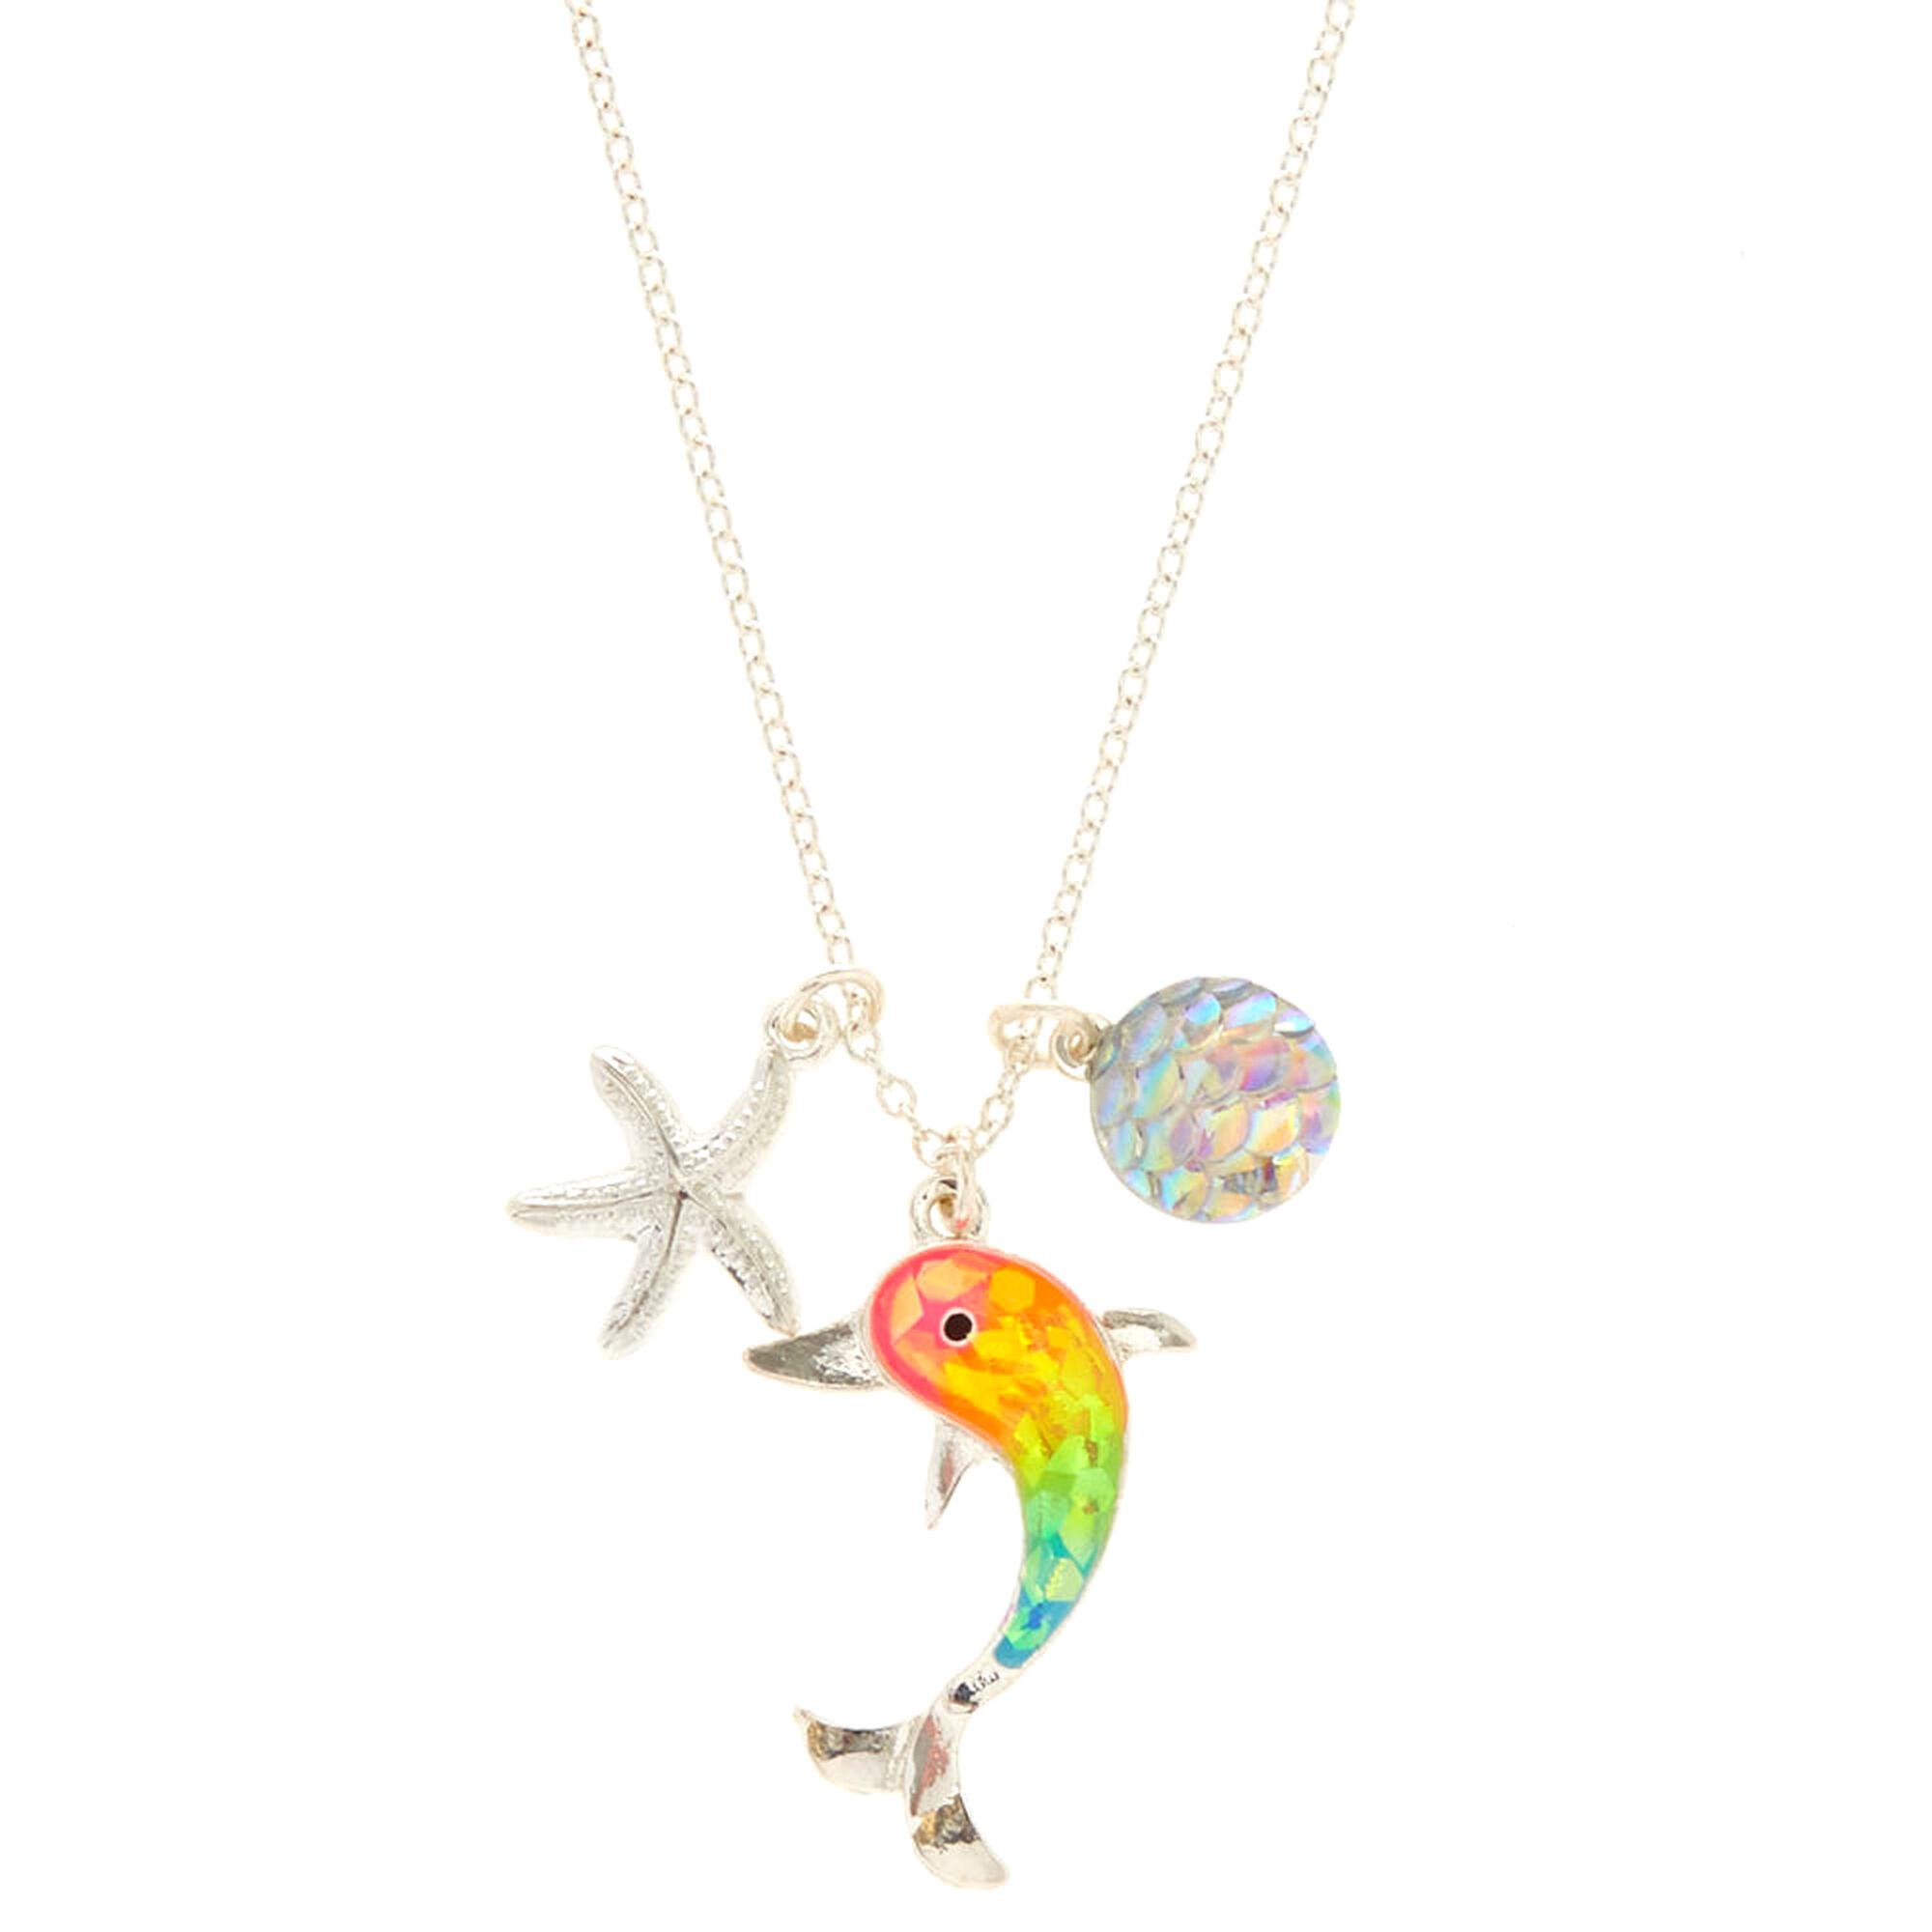 Rainbow holographic dolphin pendant necklace claires us rainbow holographic dolphin pendant necklace aloadofball Gallery